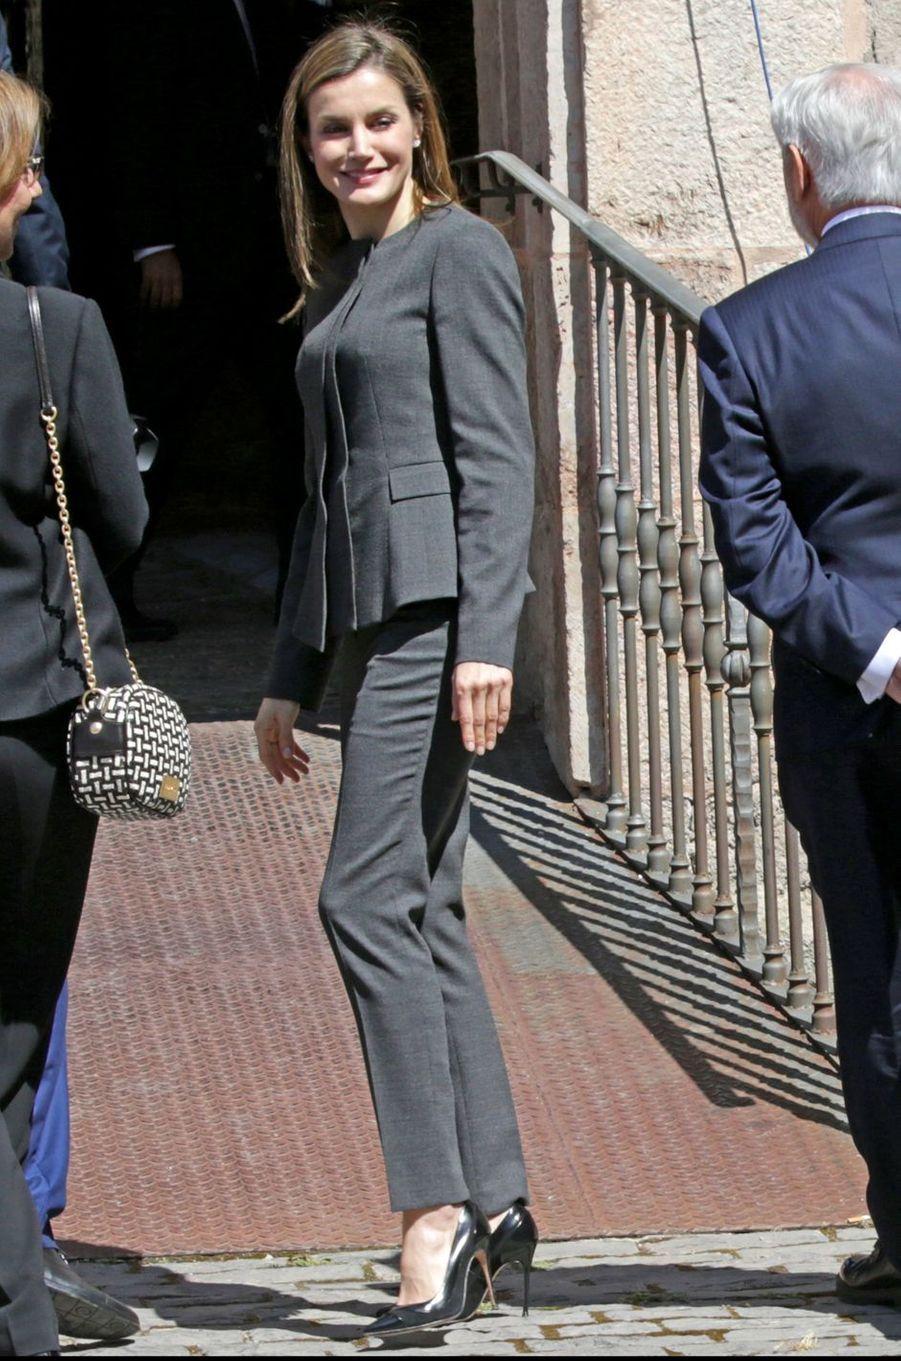 La reine Letizia d'Espagne en tailleur pantalon Hugo Boss à San Millán de la Cogolla, le 3 mai 2017